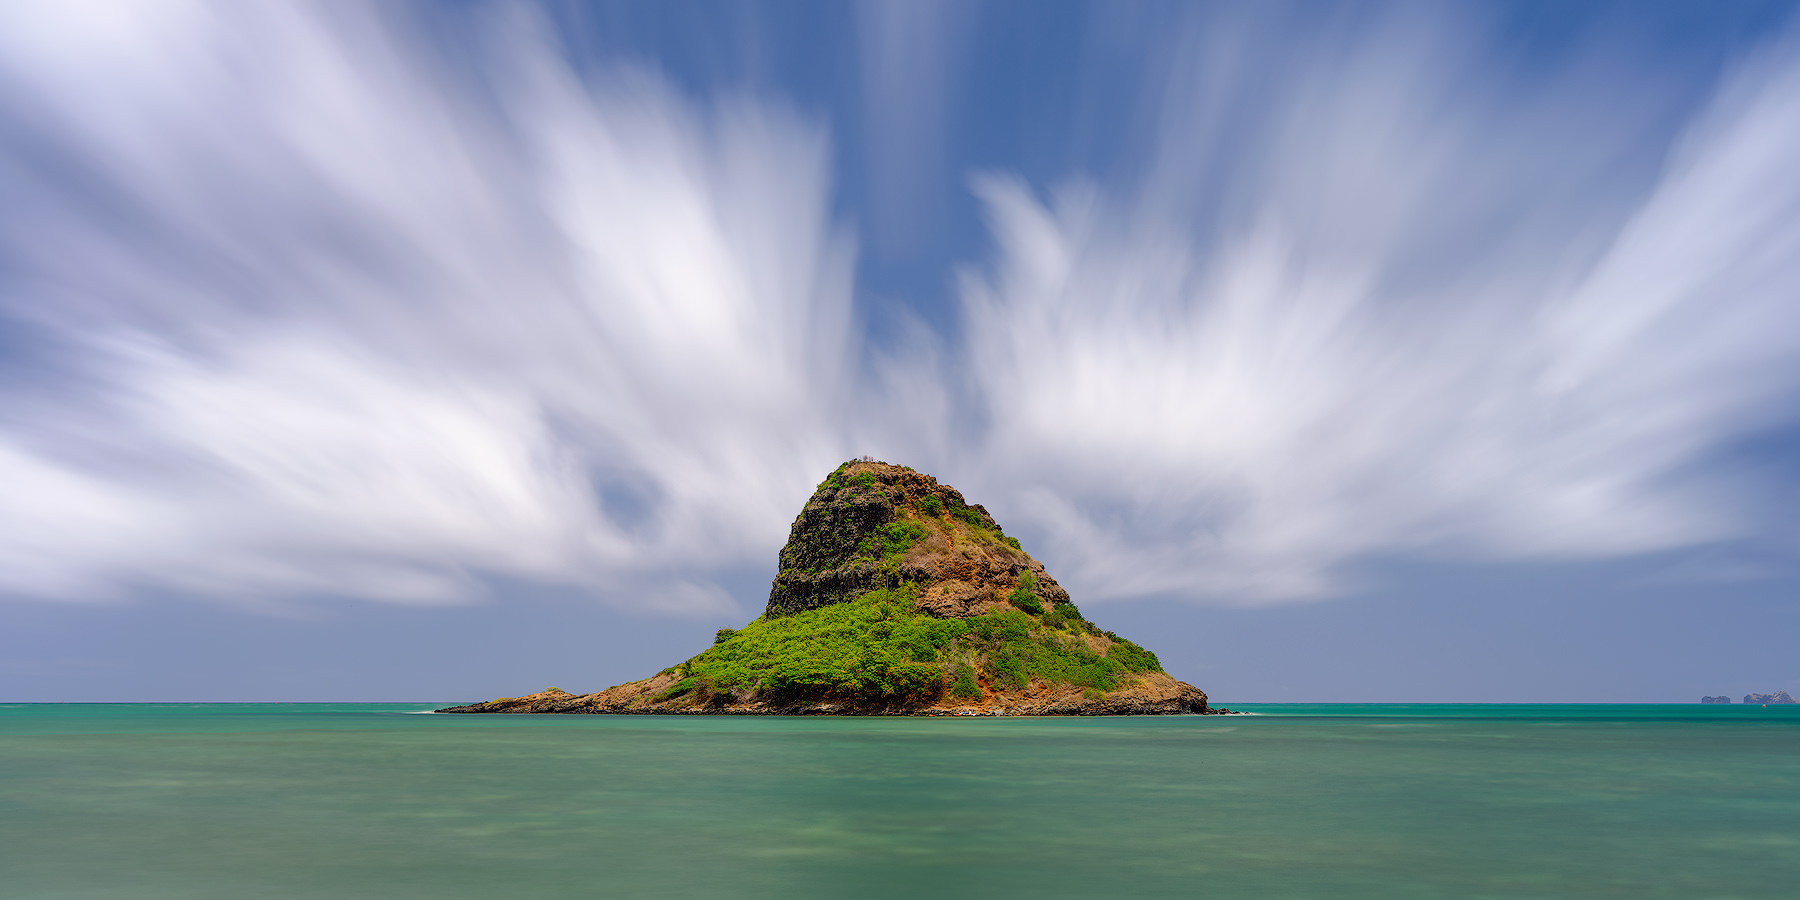 a long exposure of chinaman's hat on the hawaiian island of Oahu.  Also known as Mokoli'i Island, a beautiful scene captured by photographer Andrew Shoemaker